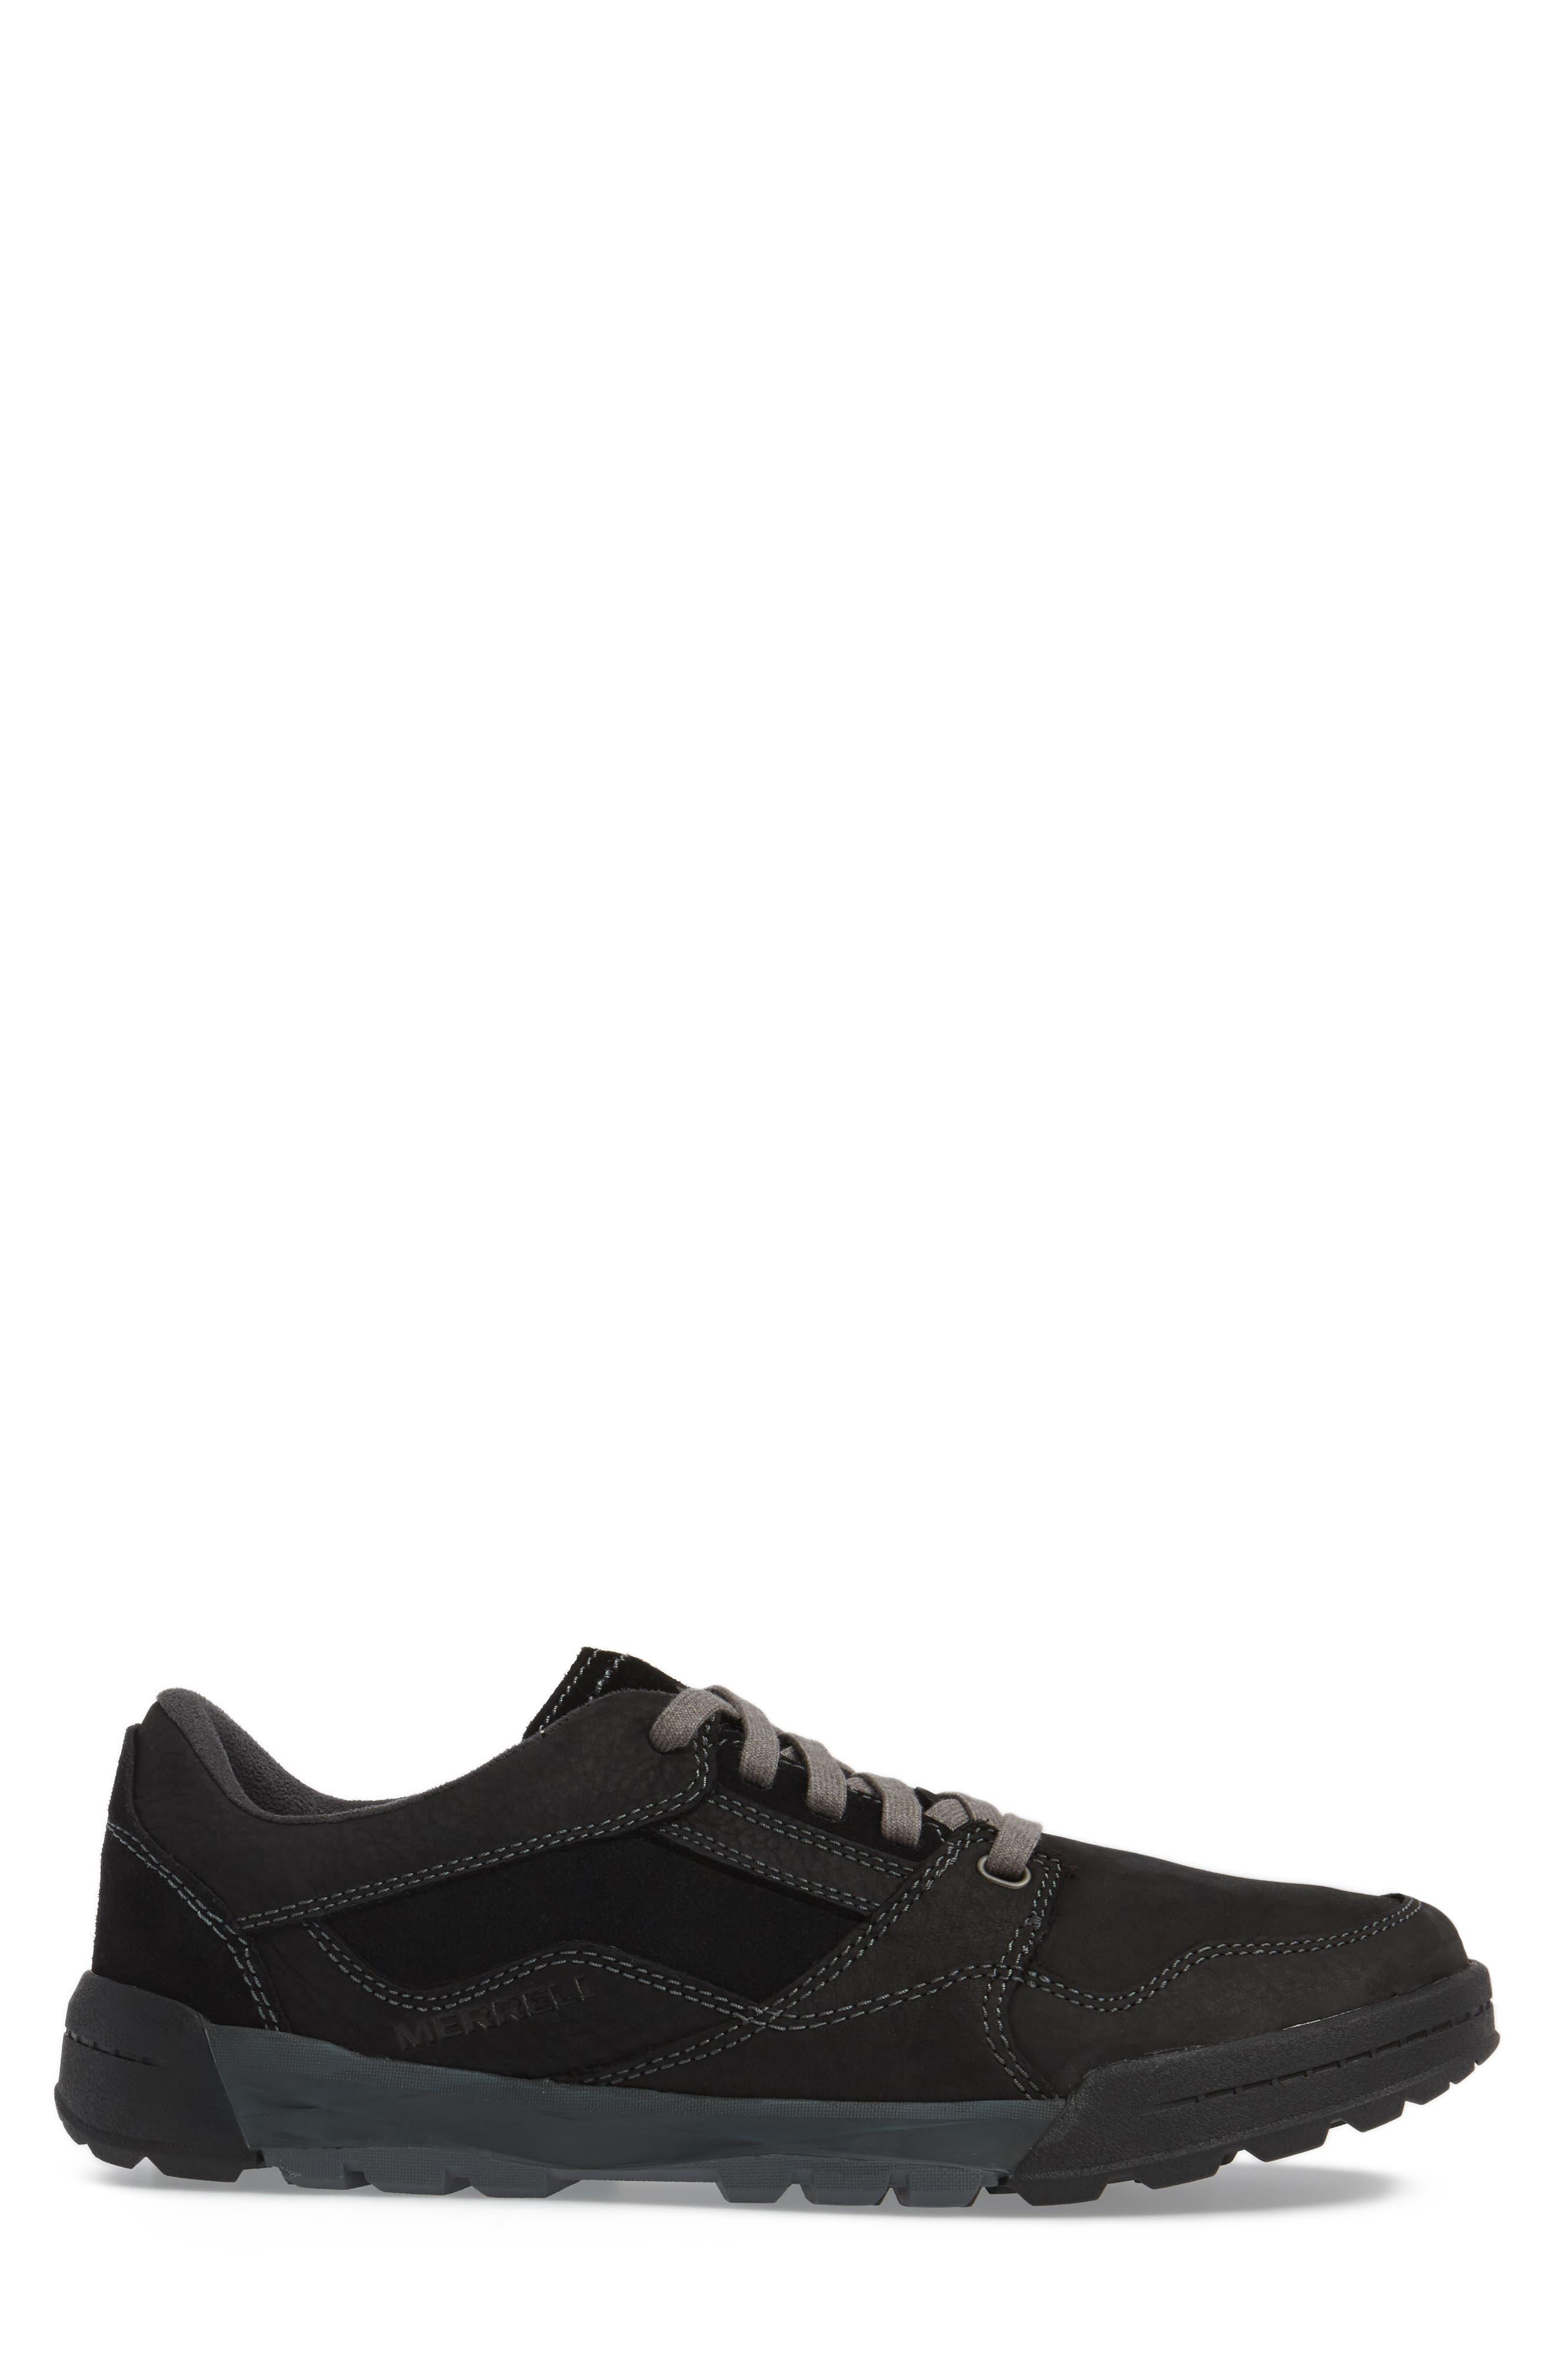 Berner Sneaker,                             Alternate thumbnail 3, color,                             001